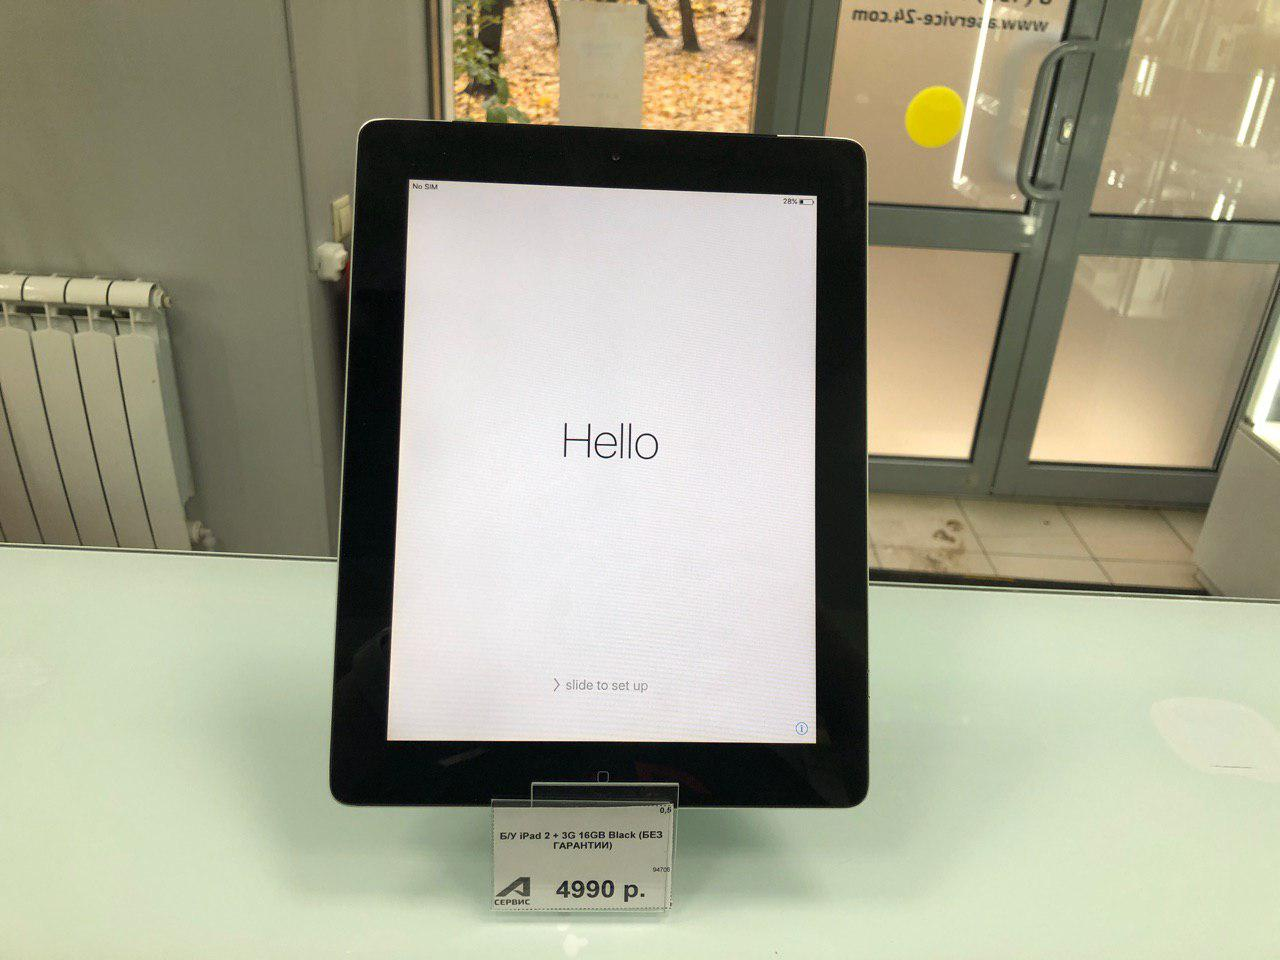 Б/У iPad 2 + 3G 16GB Black